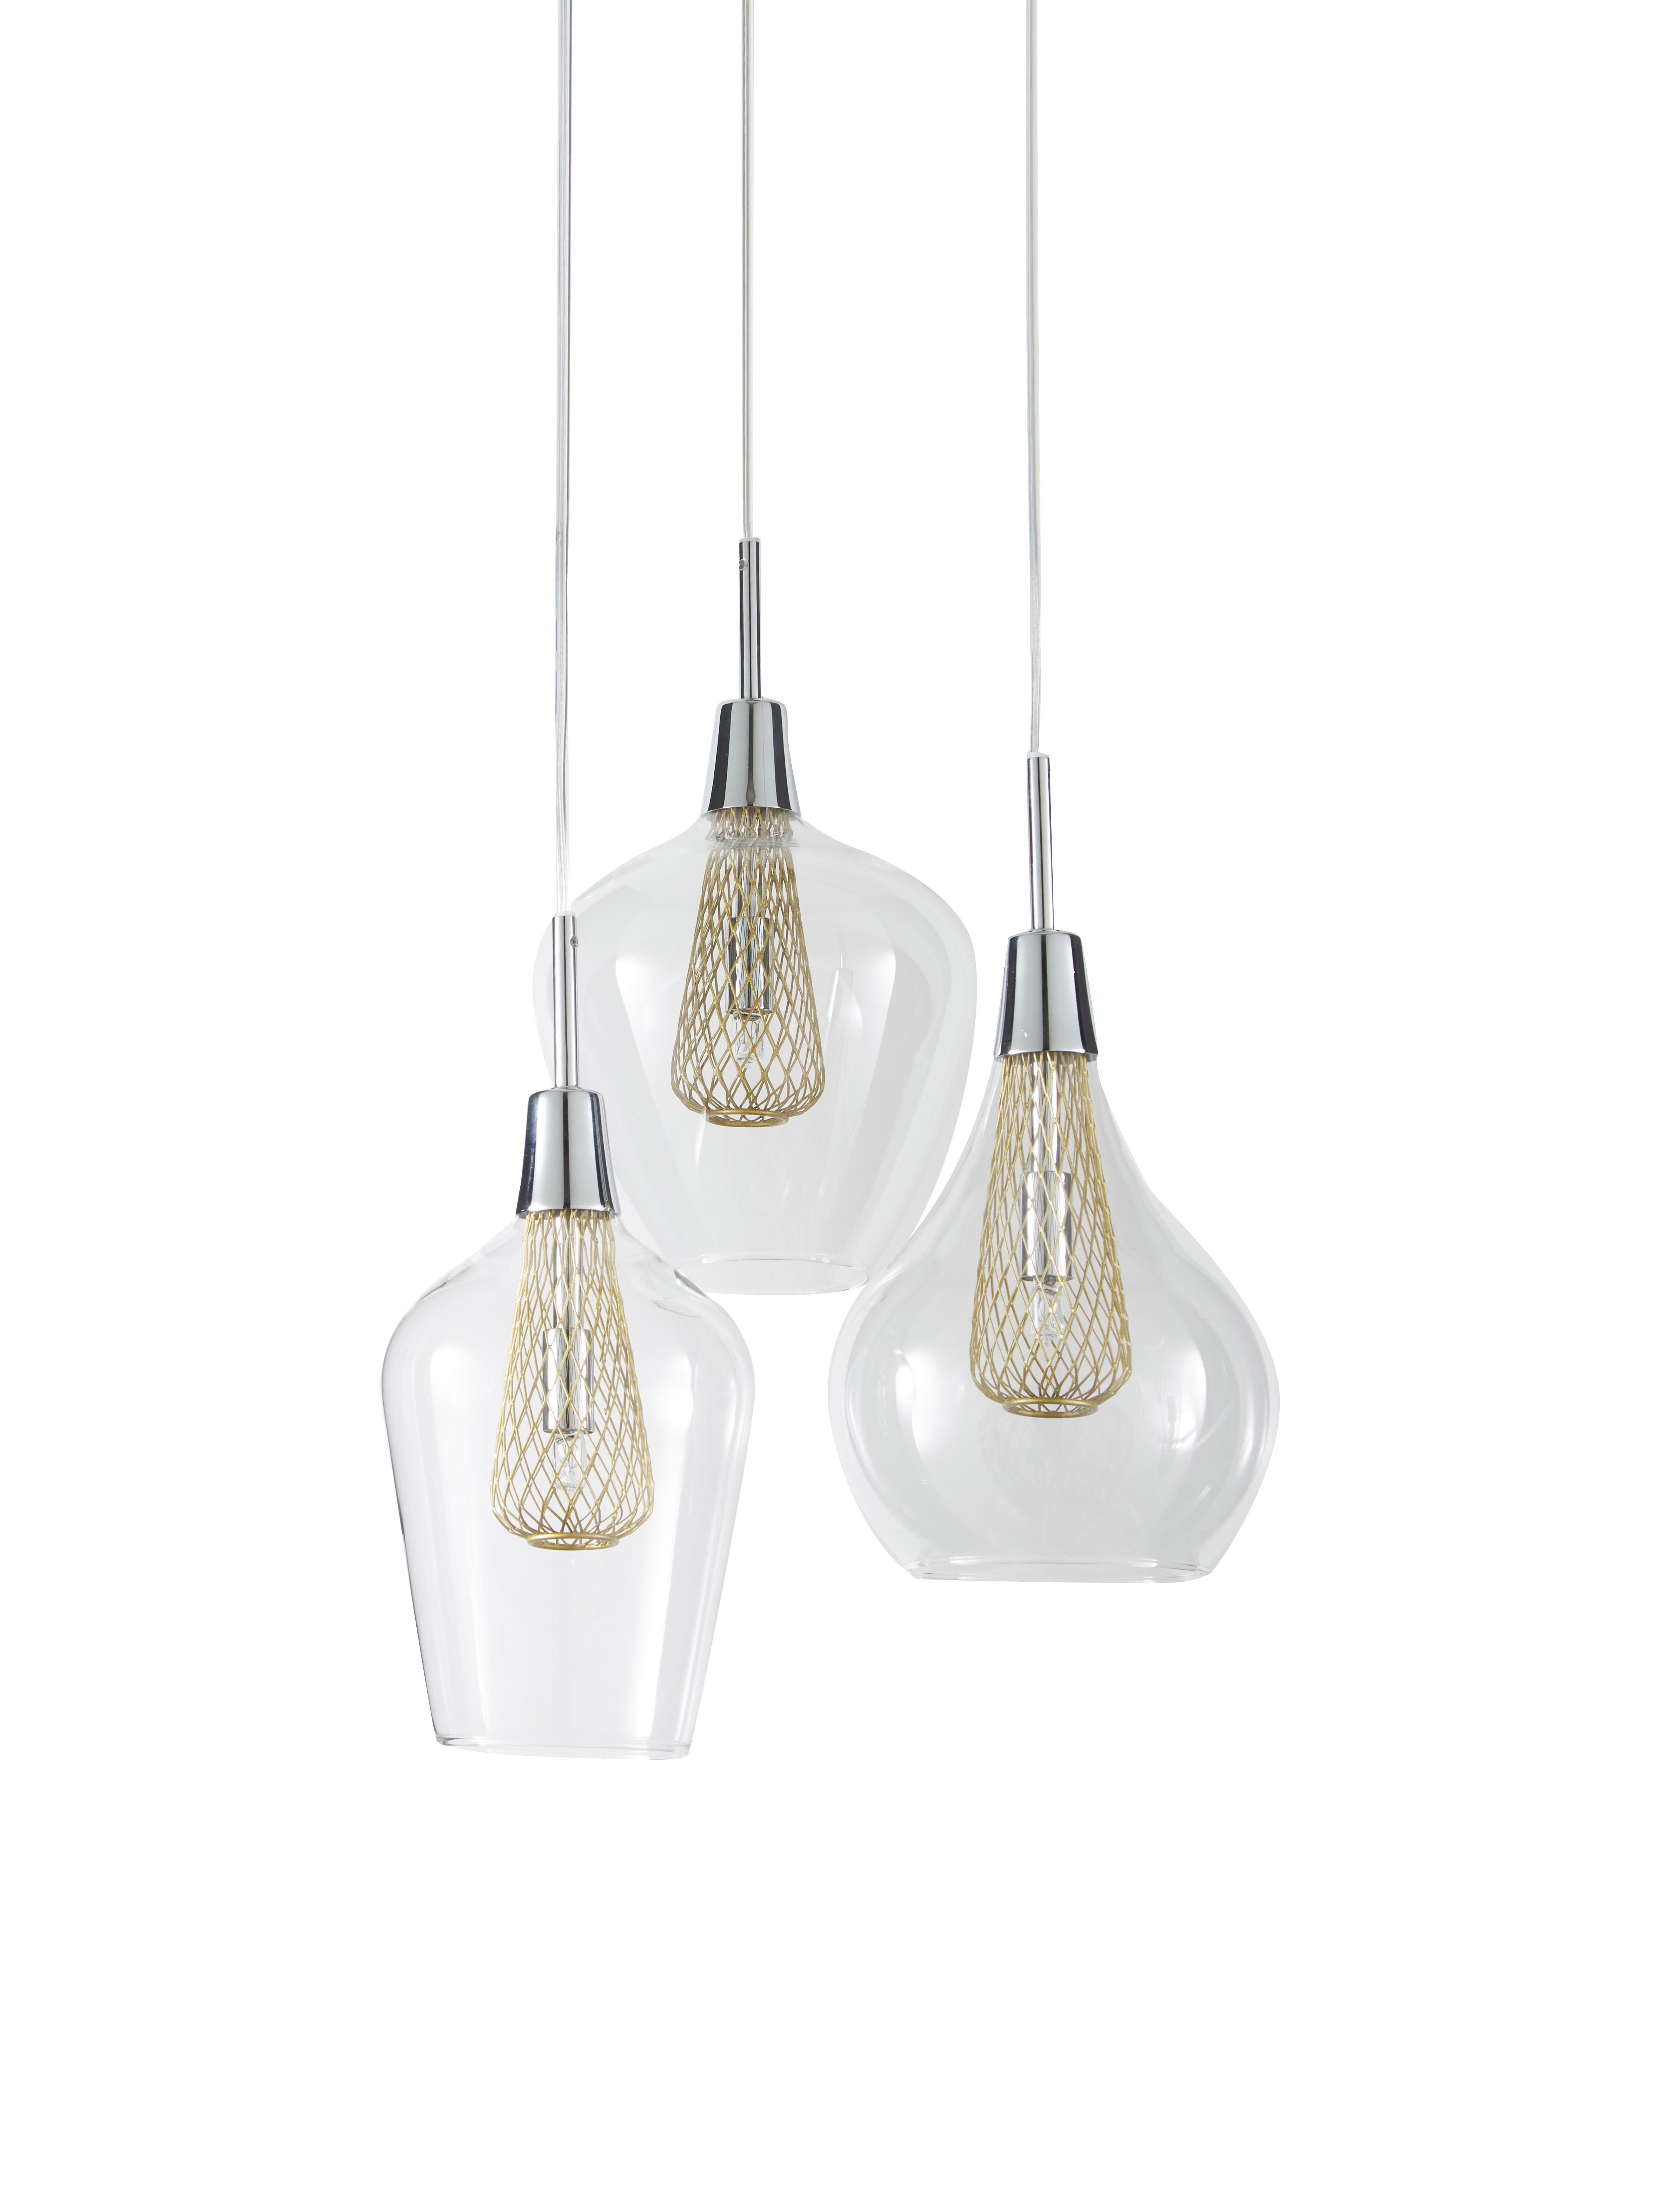 Lámpara de techo Filo, Cable: gris, Transparente, latón, Ø 36 x Al 120 cm